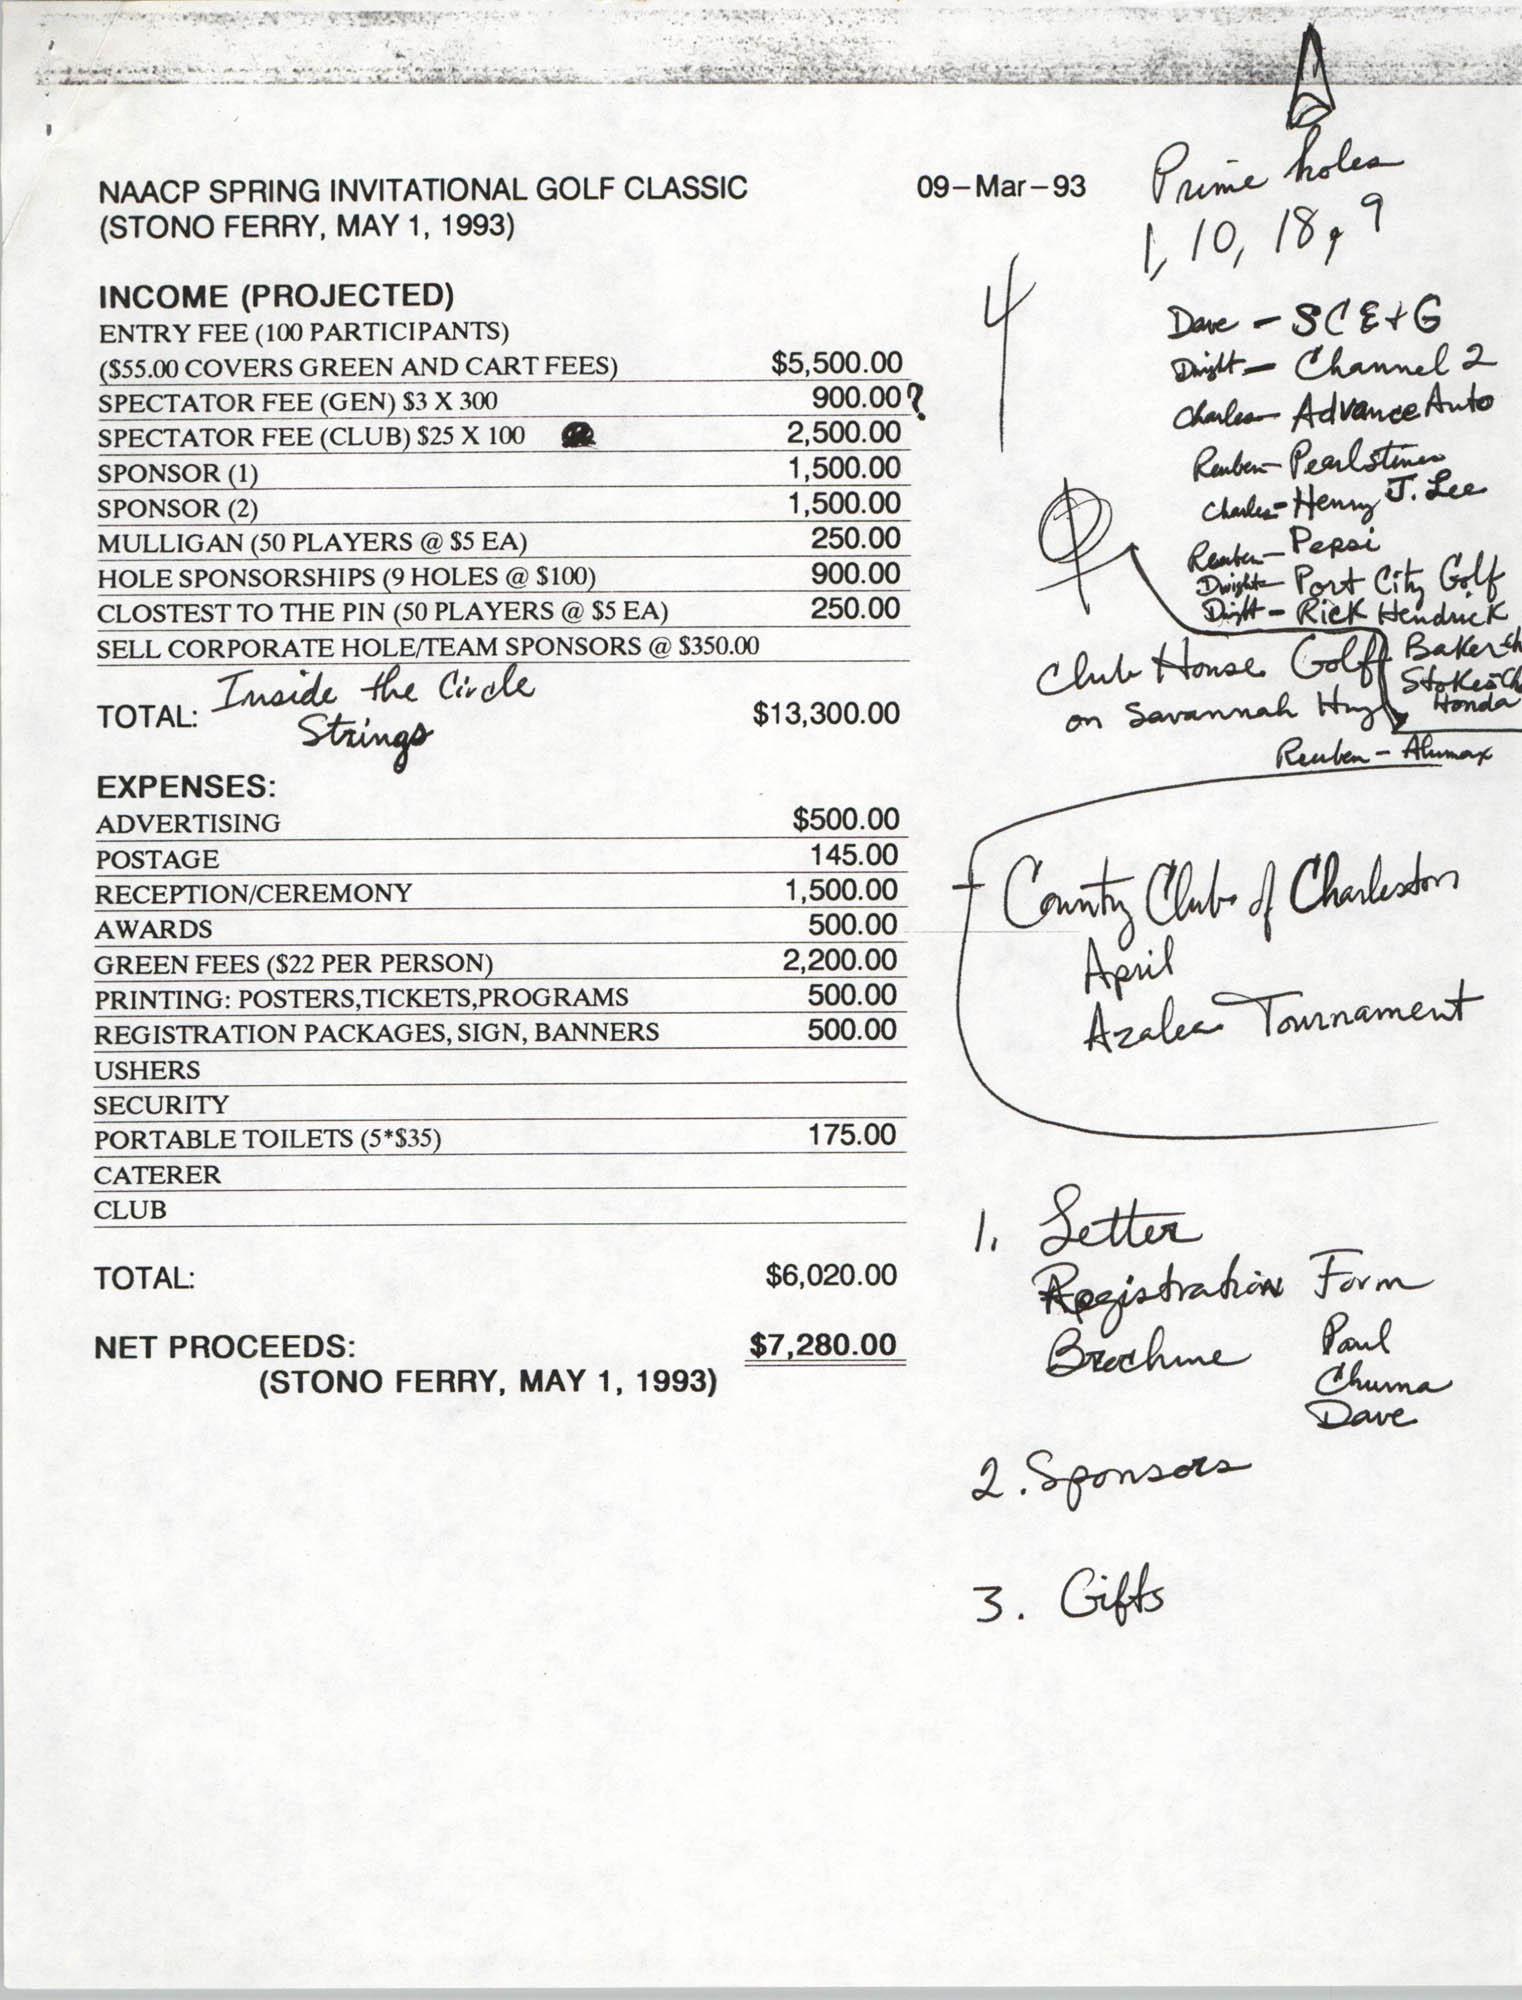 Budget, NAACP Spring Invitational Golf Classic, Stono Ferry, 1993